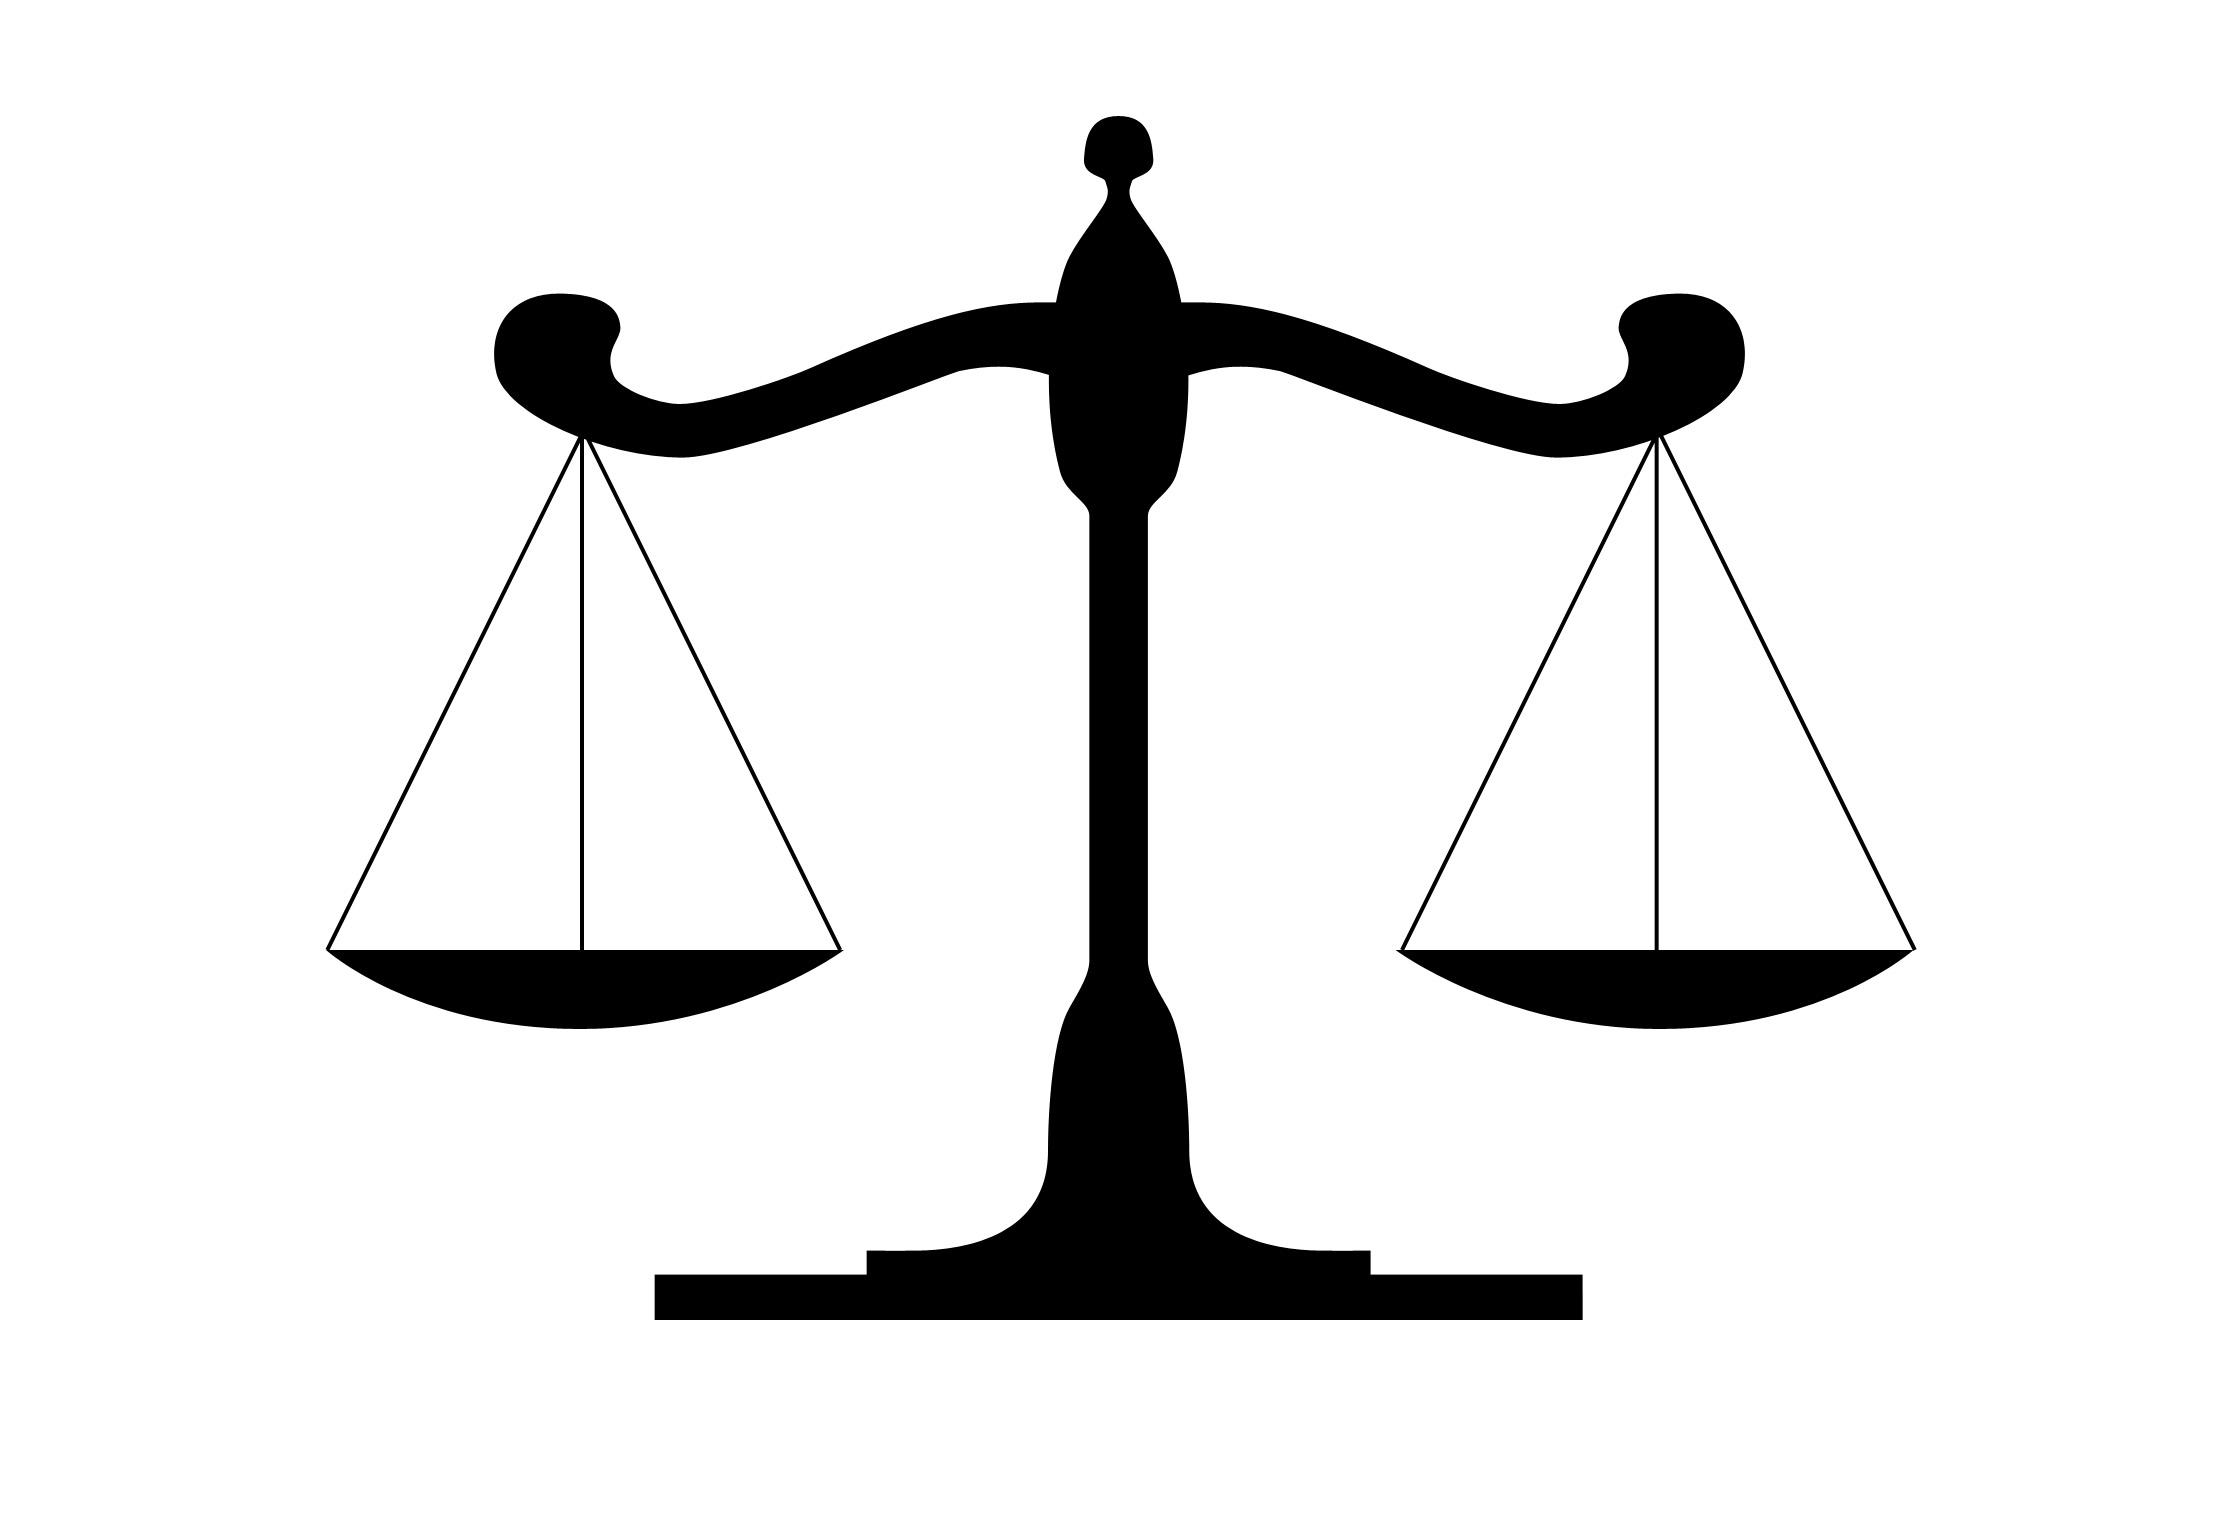 Balance-Scales | PEMPTOUSIA